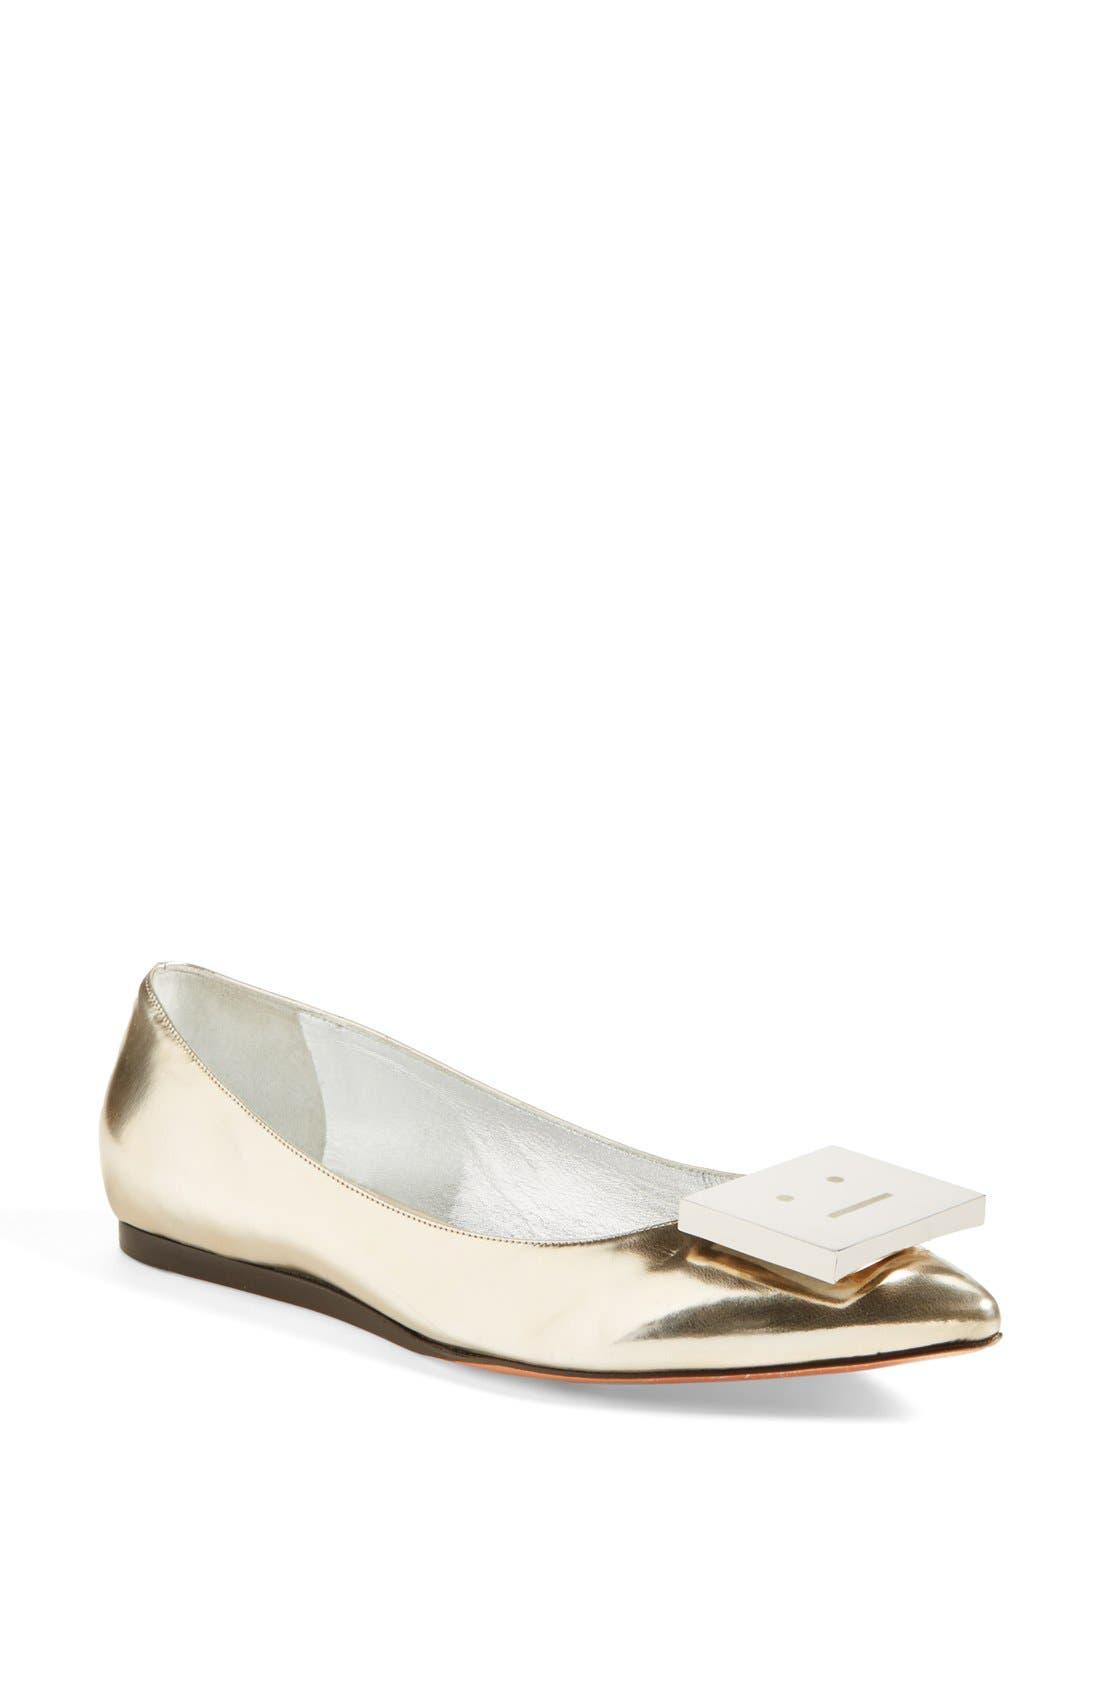 Main Image - Acne Studios 'Aida' Pointy Toe Metallic Leather Flat